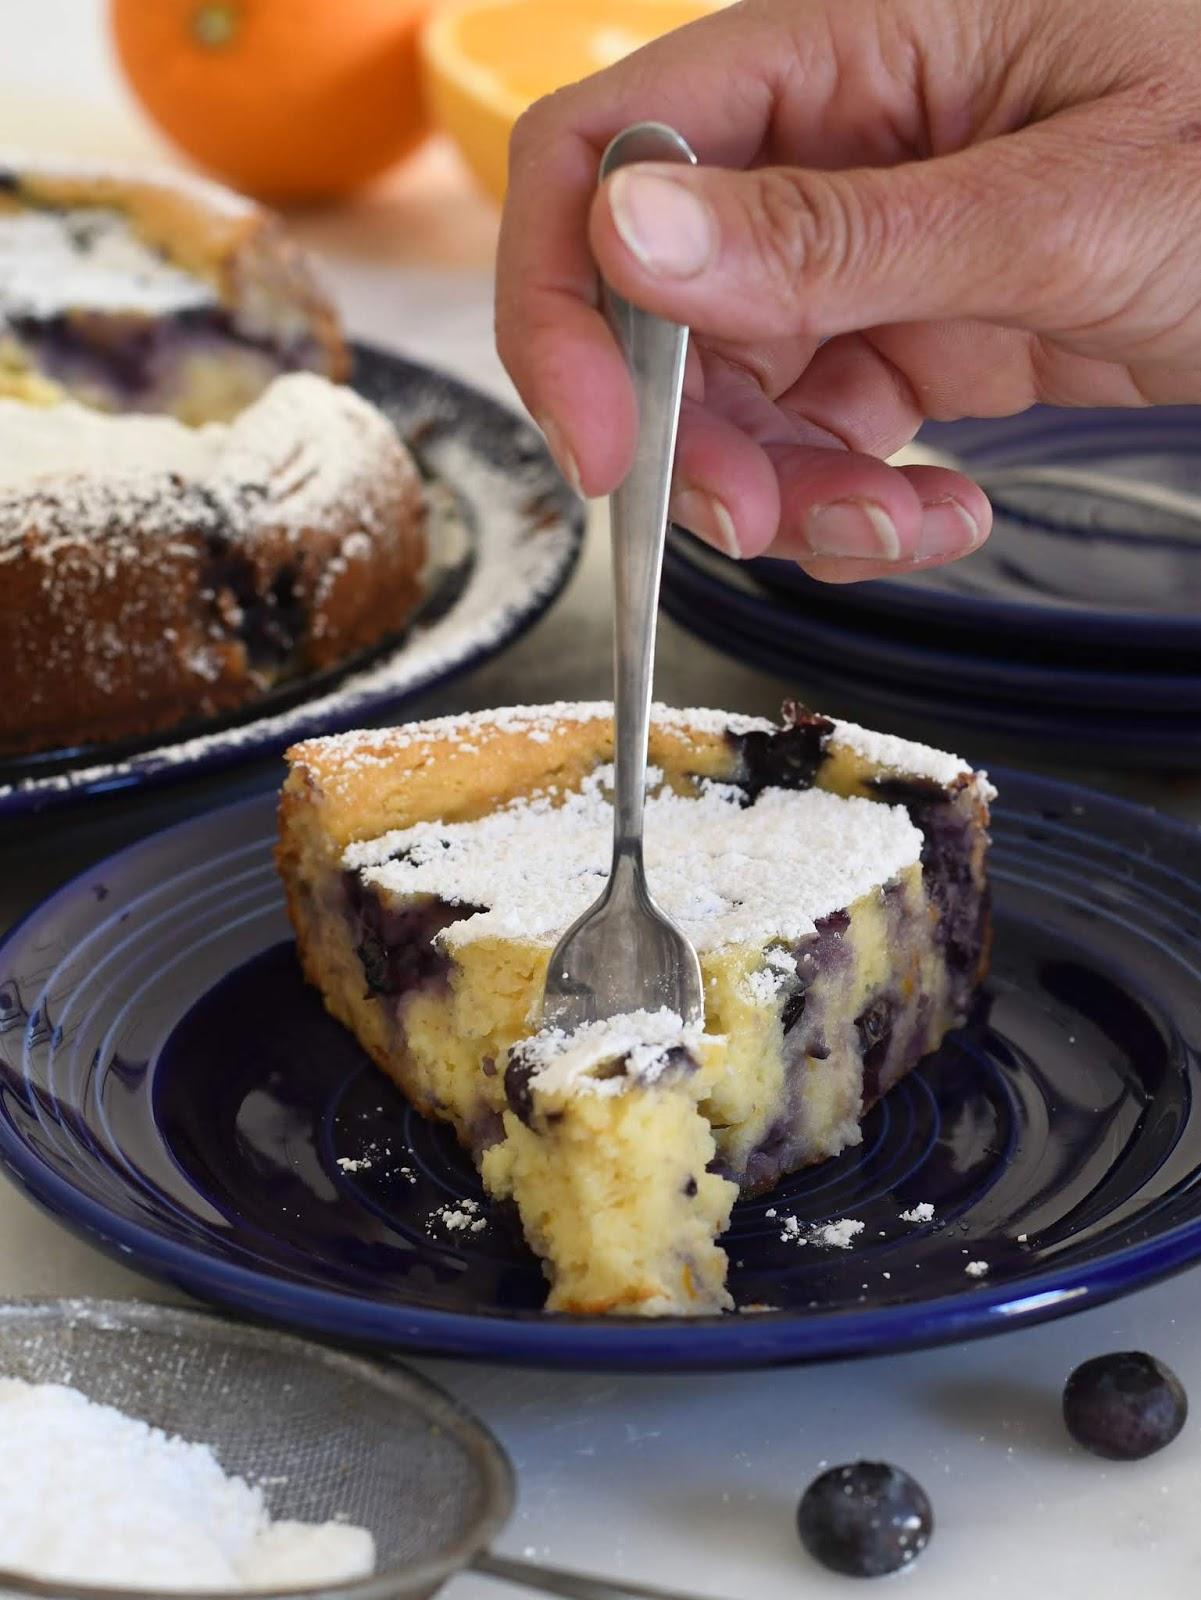 Italian Ricotta Cheese Cake with Blueberries